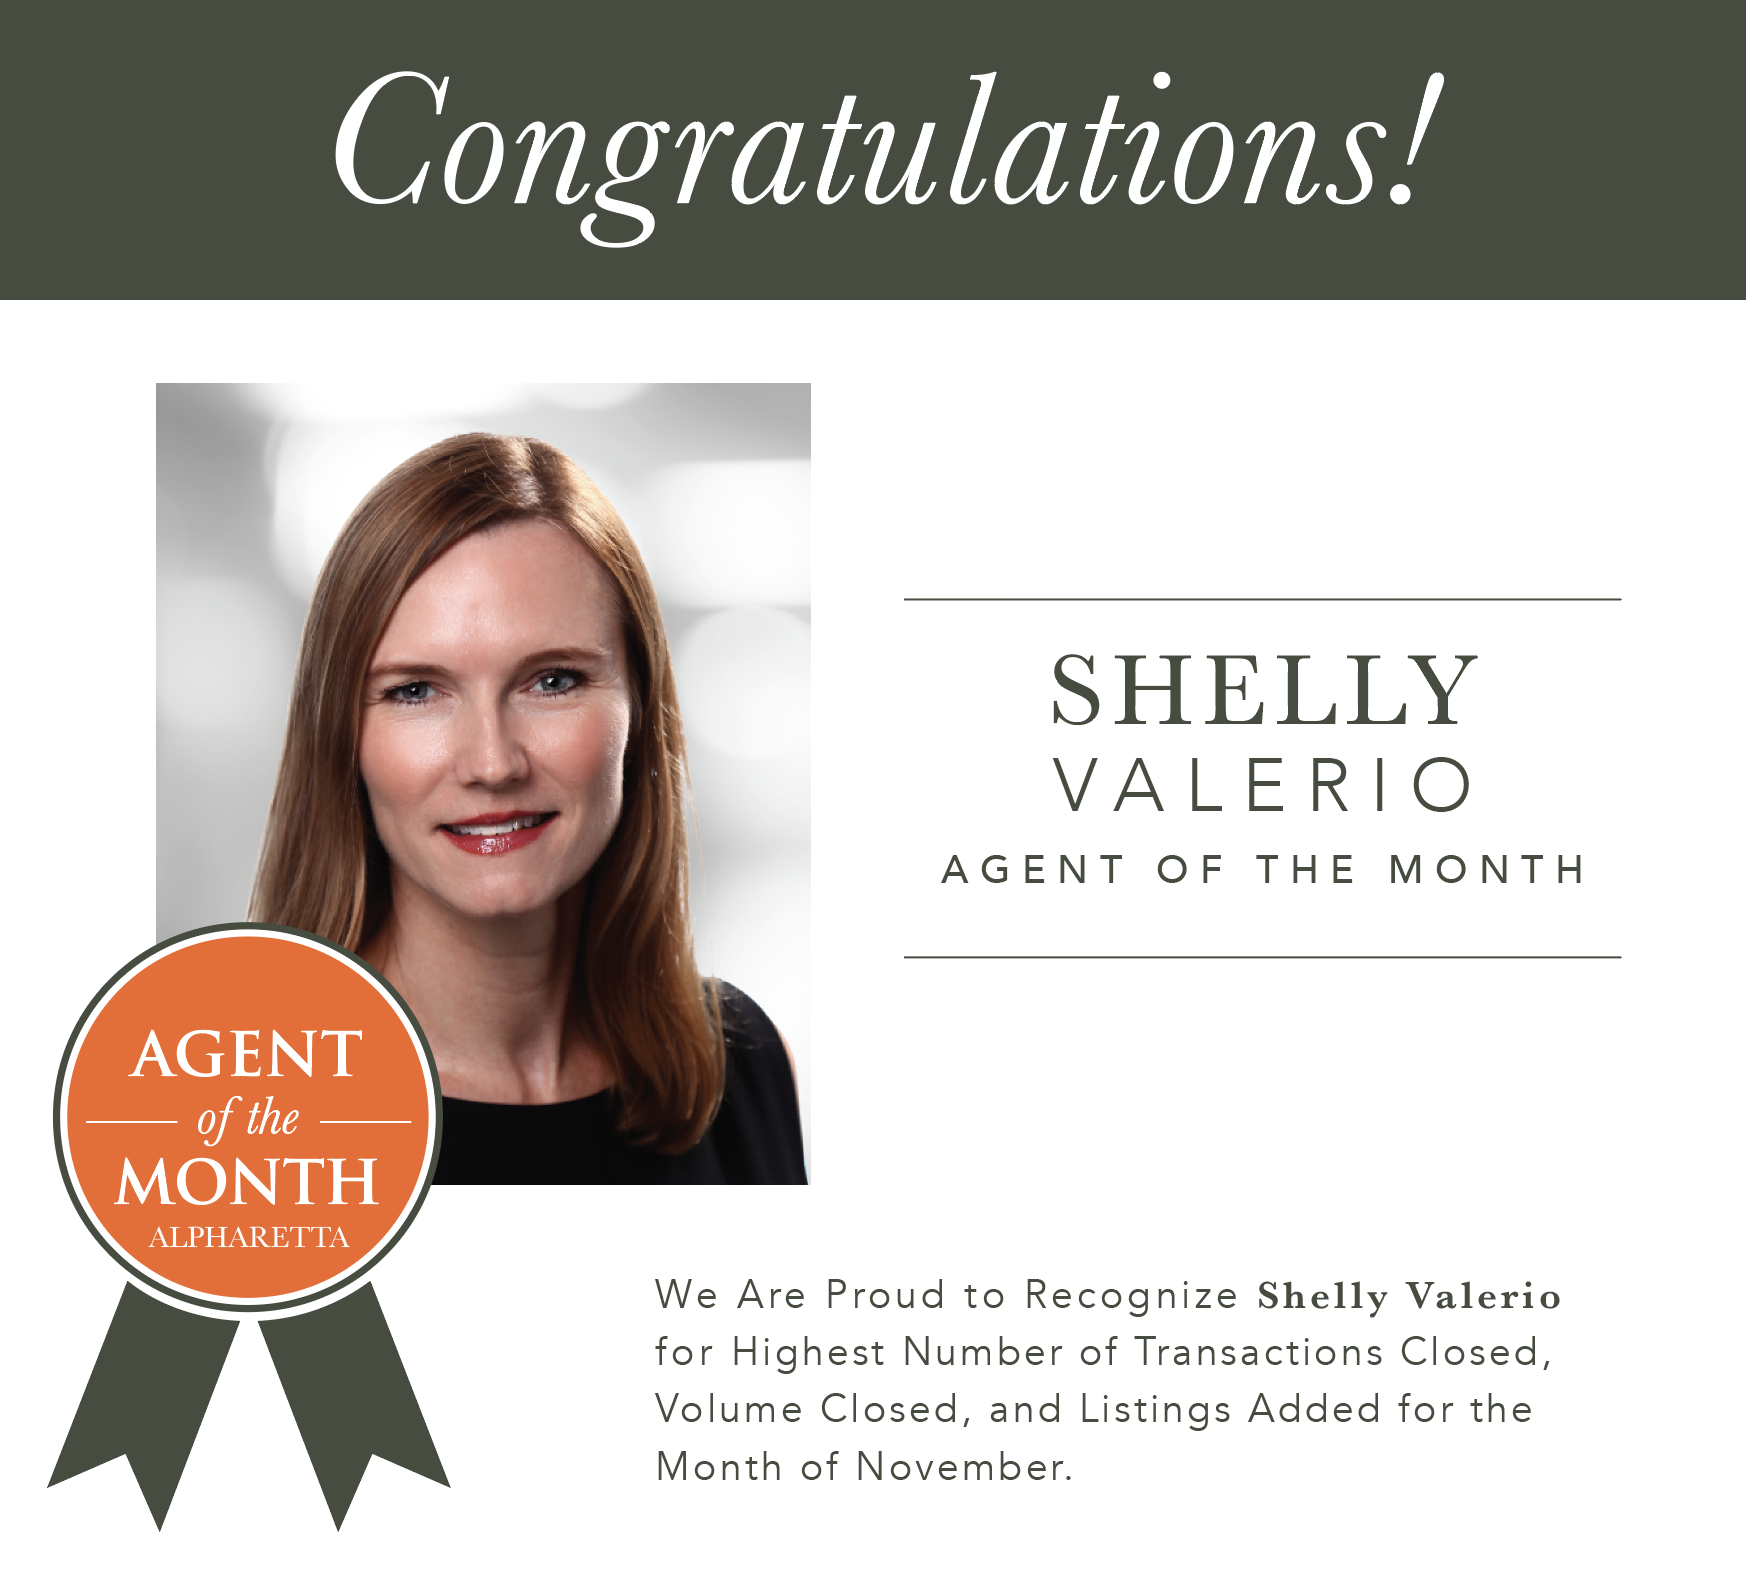 Muffley & Associates Real Estate Alpharetta November Agent of the Month